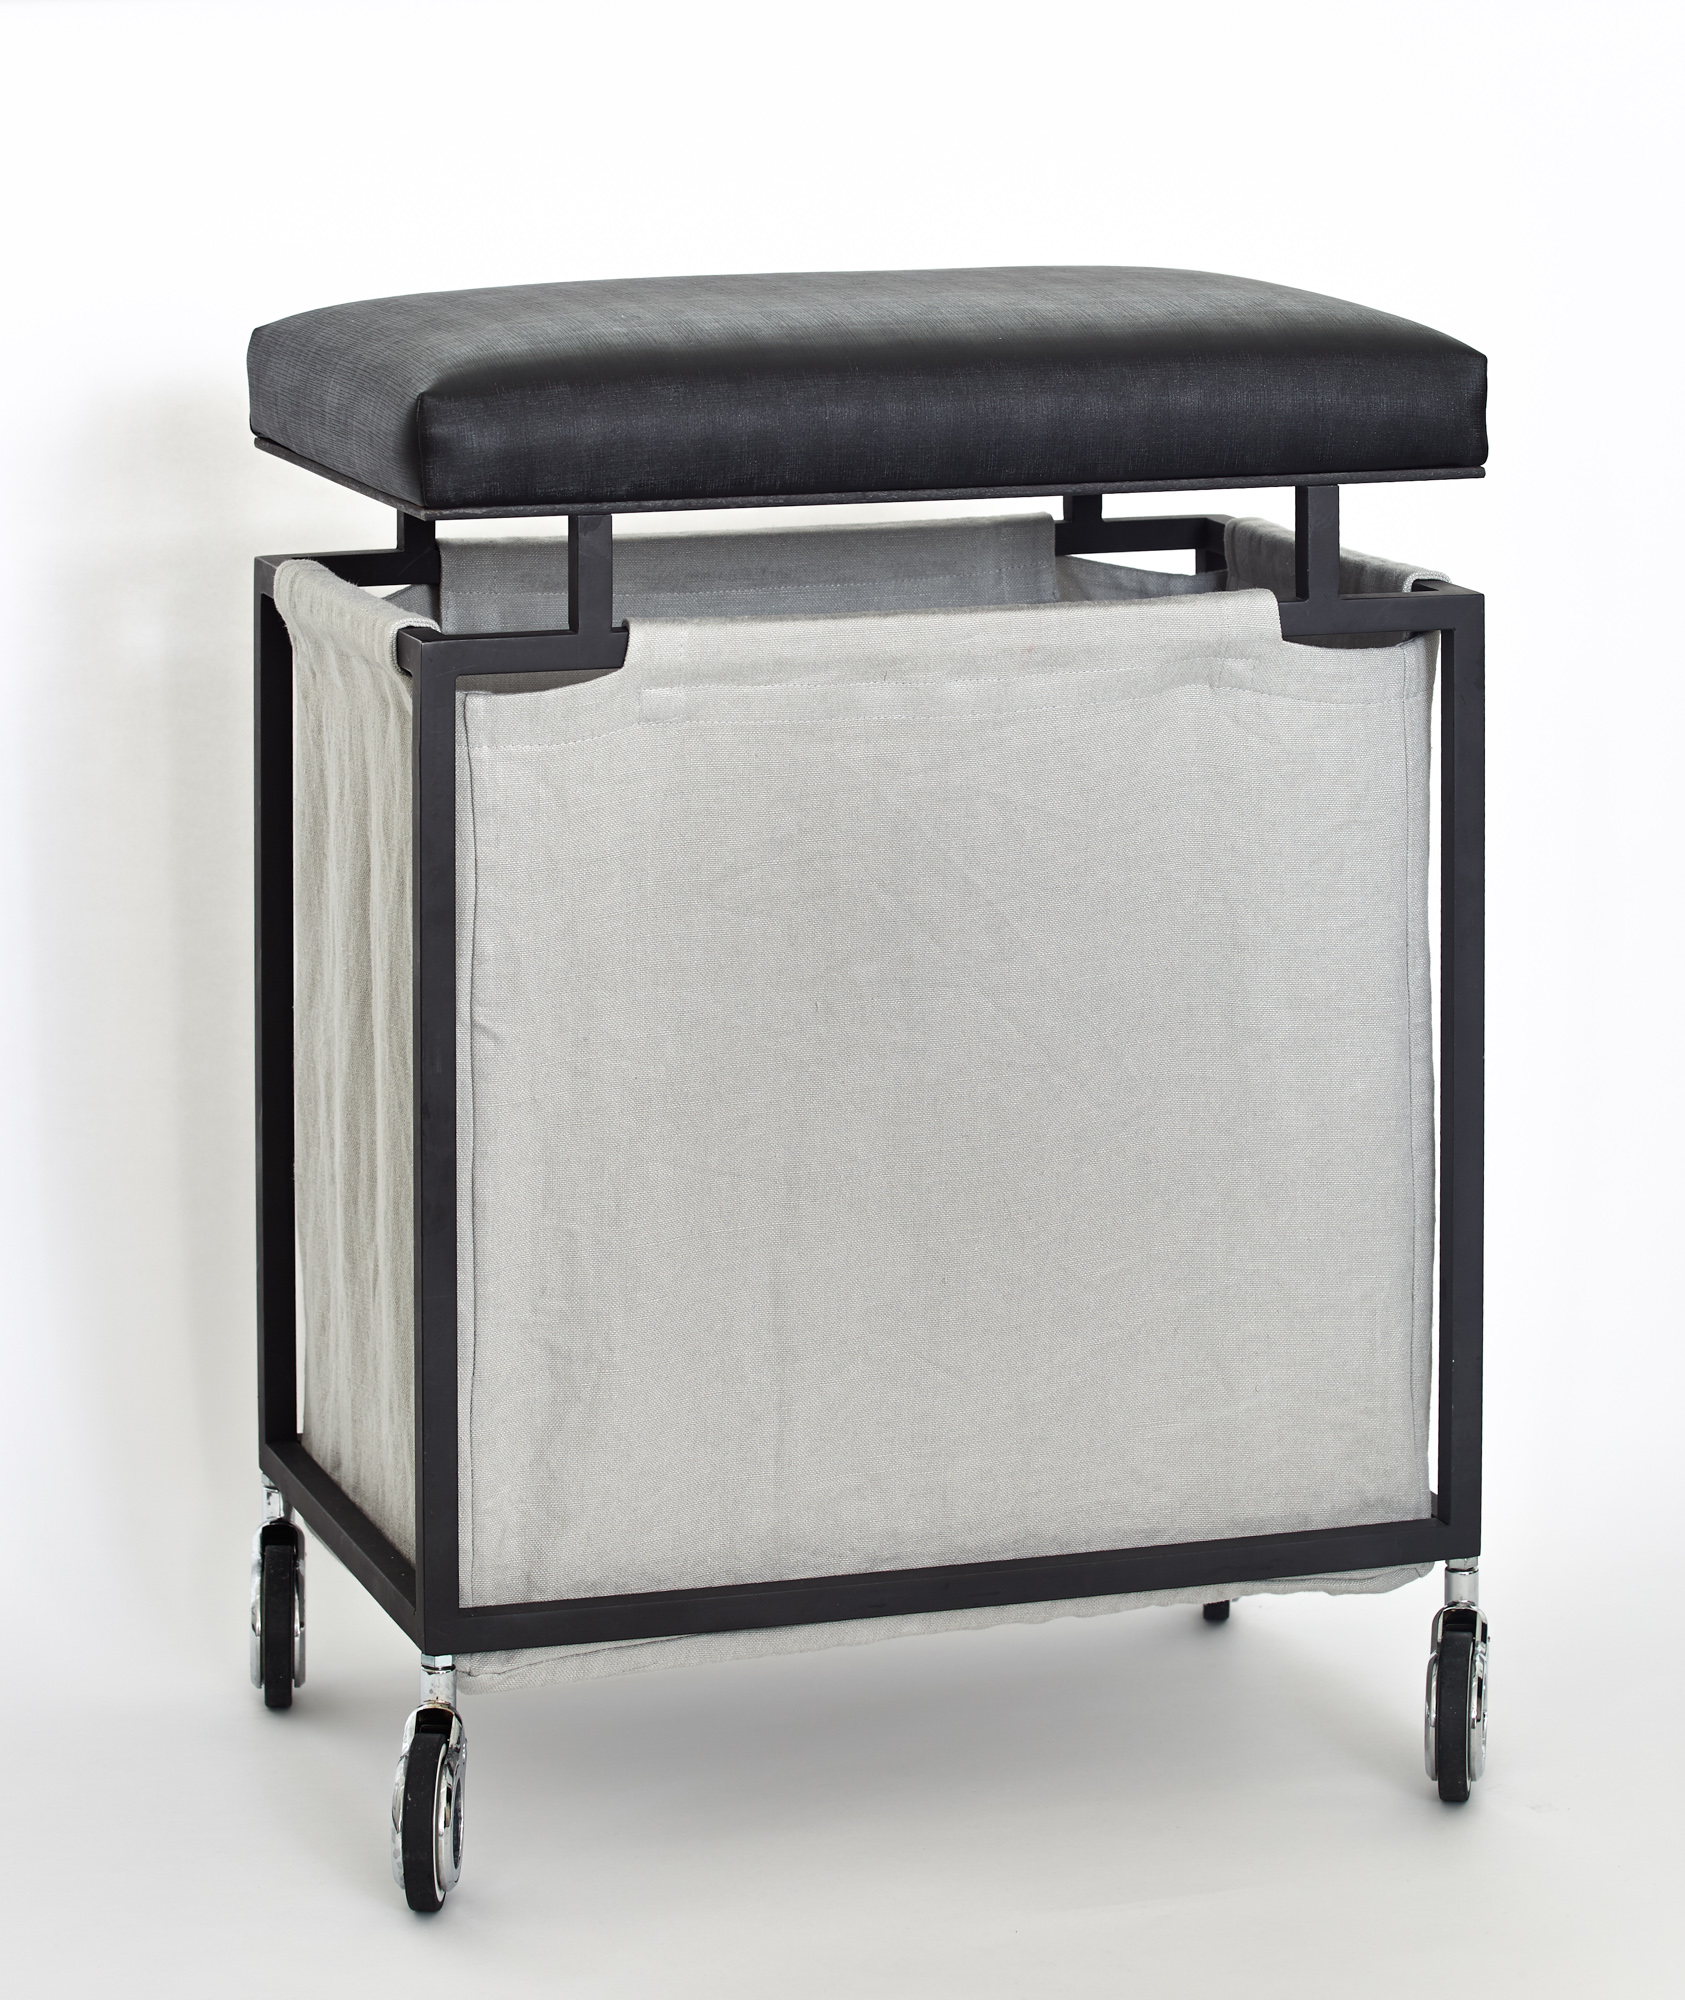 B&D Laundry Basket-6-LowRes.jpg